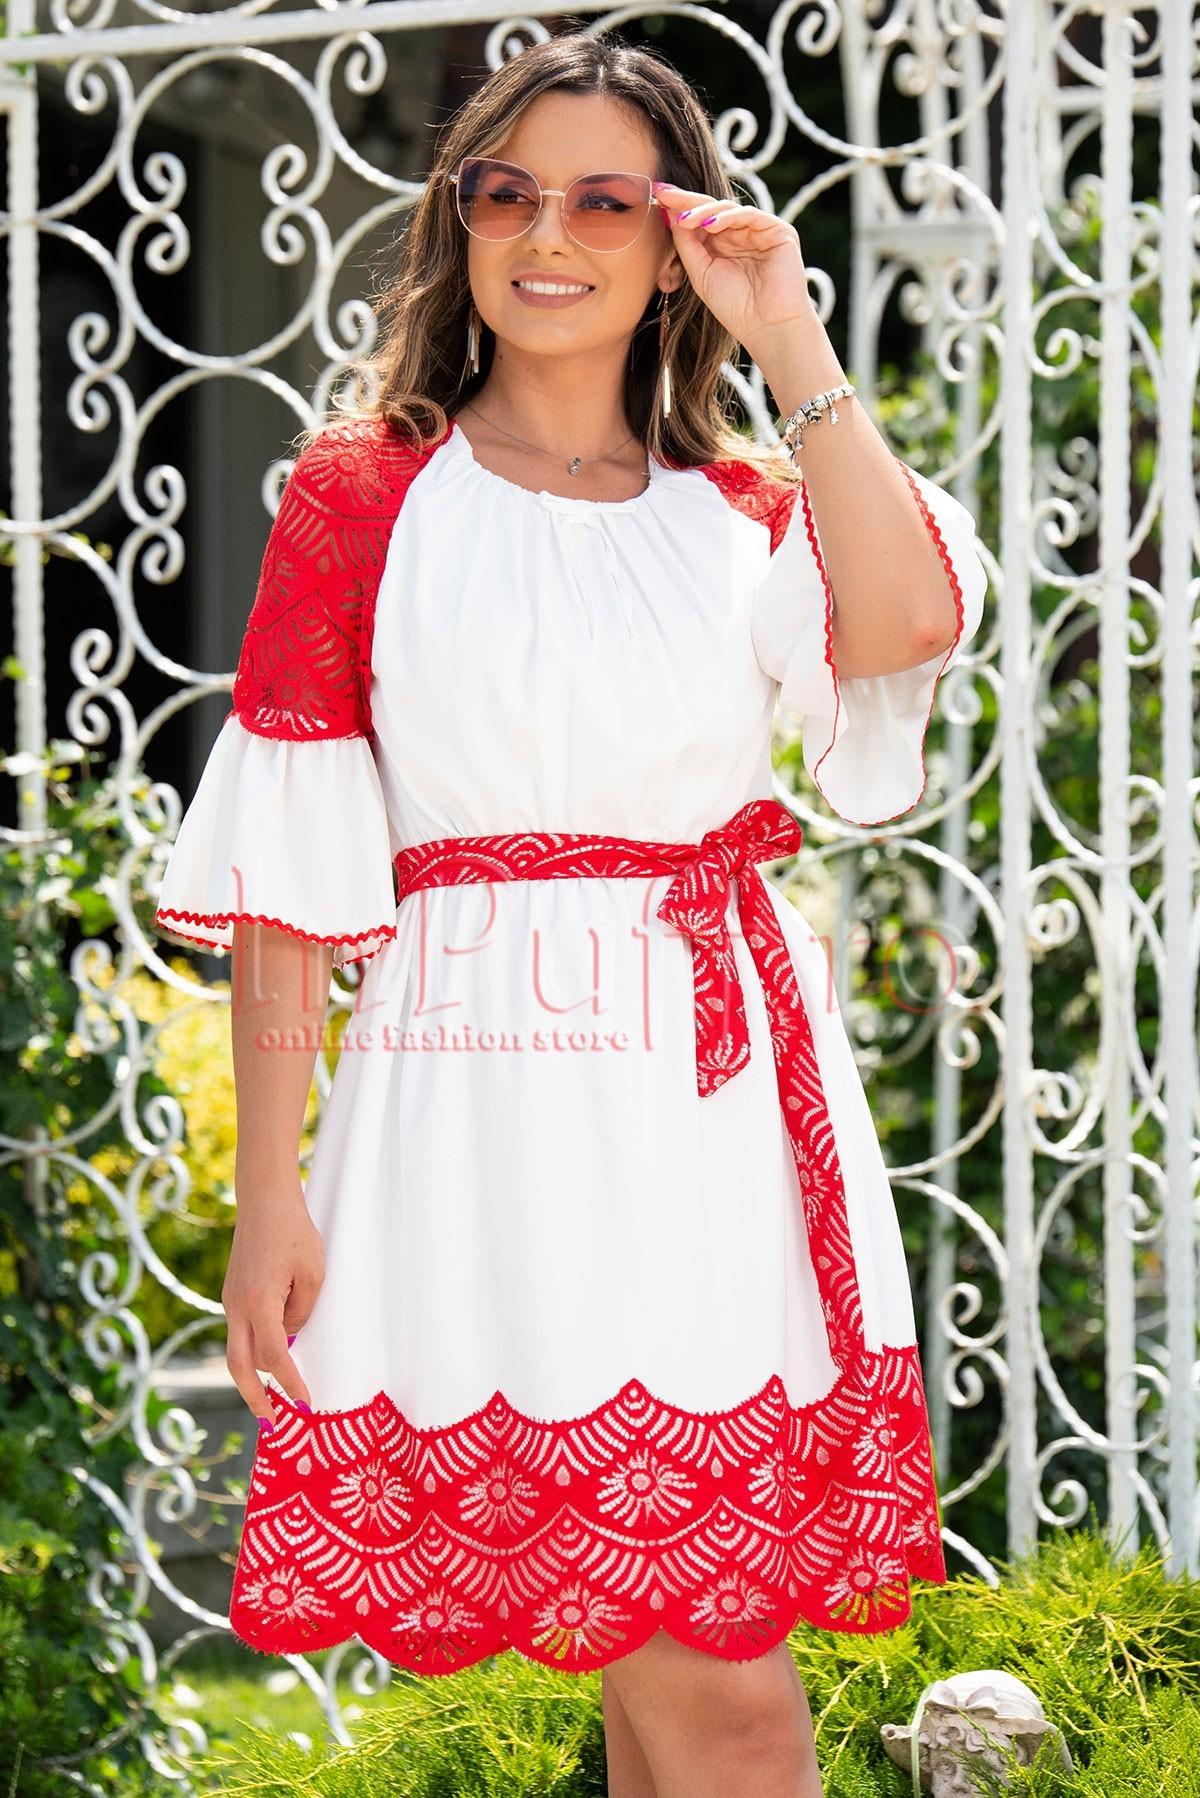 Rochie de zi alba cu inserii din dantela rosie